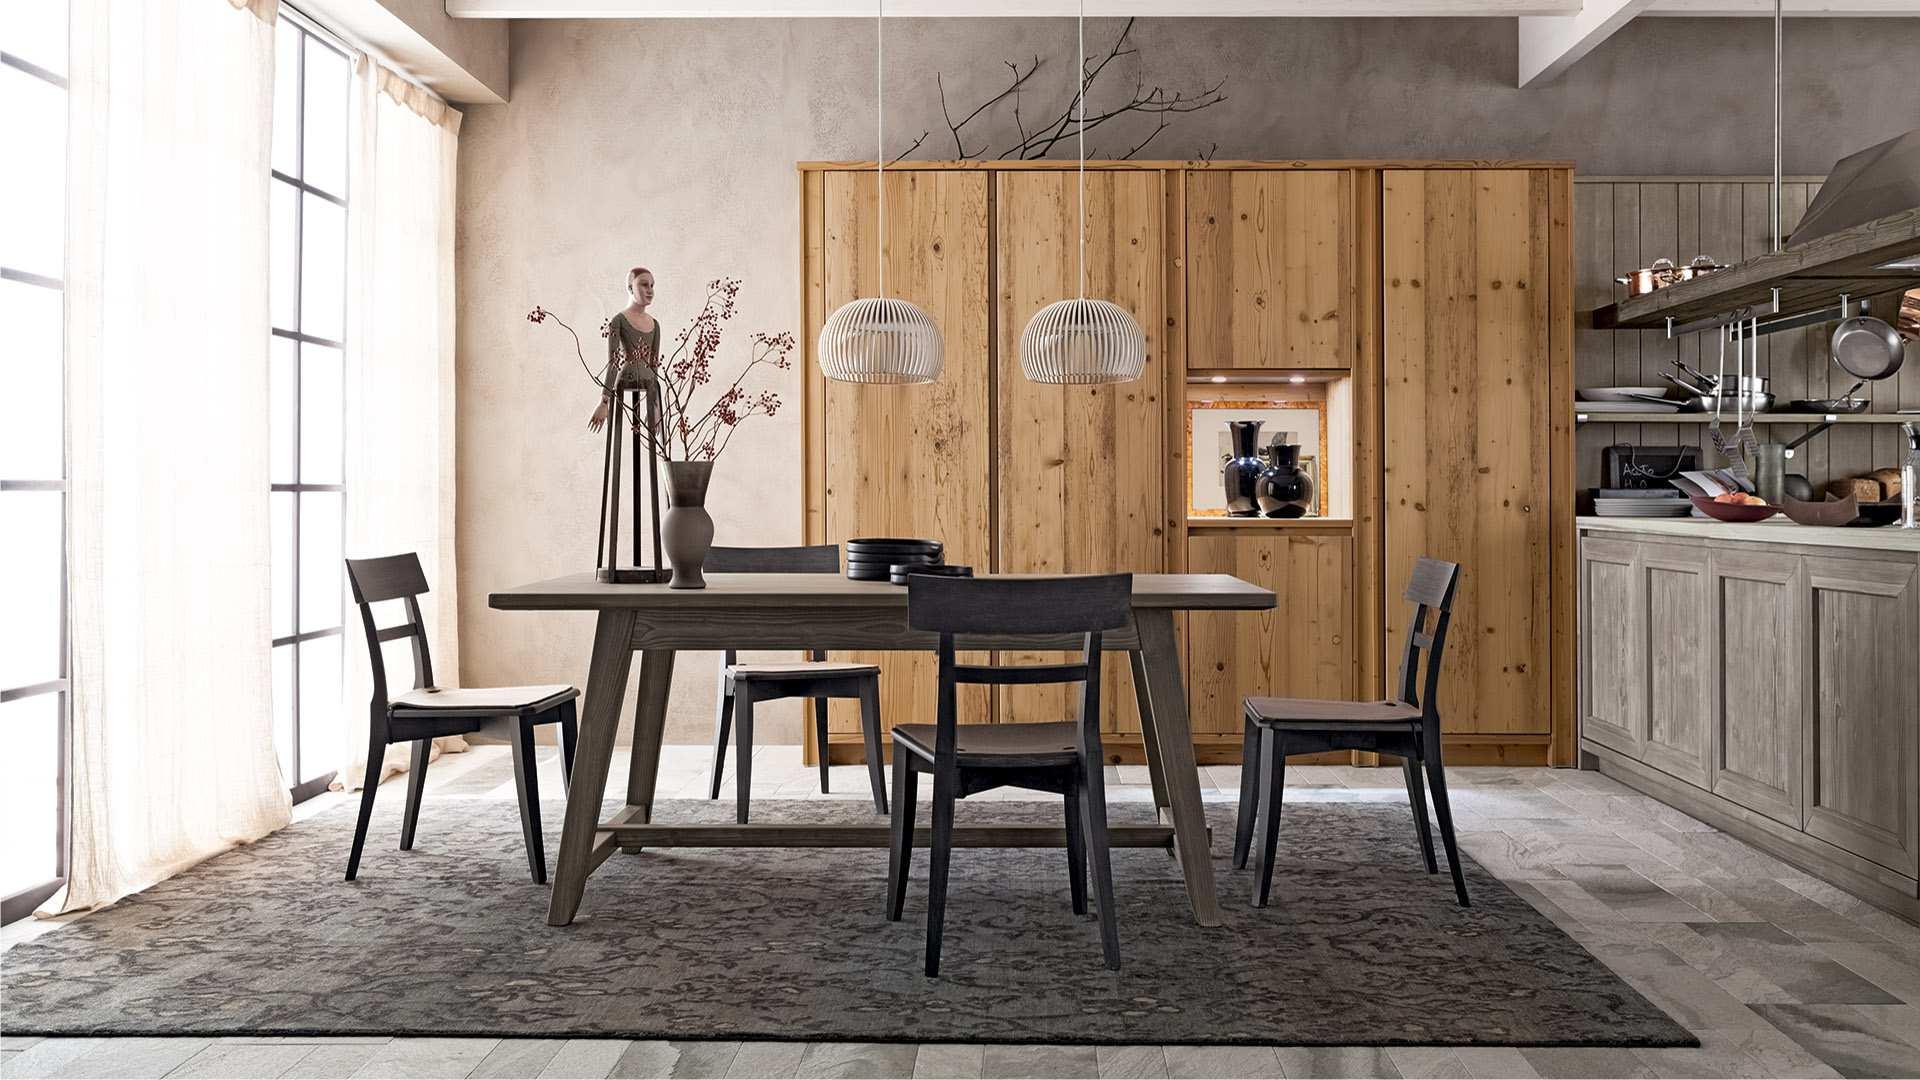 Scandola mobili - Wood Inside Journal | Arredamenti Toniolo ...